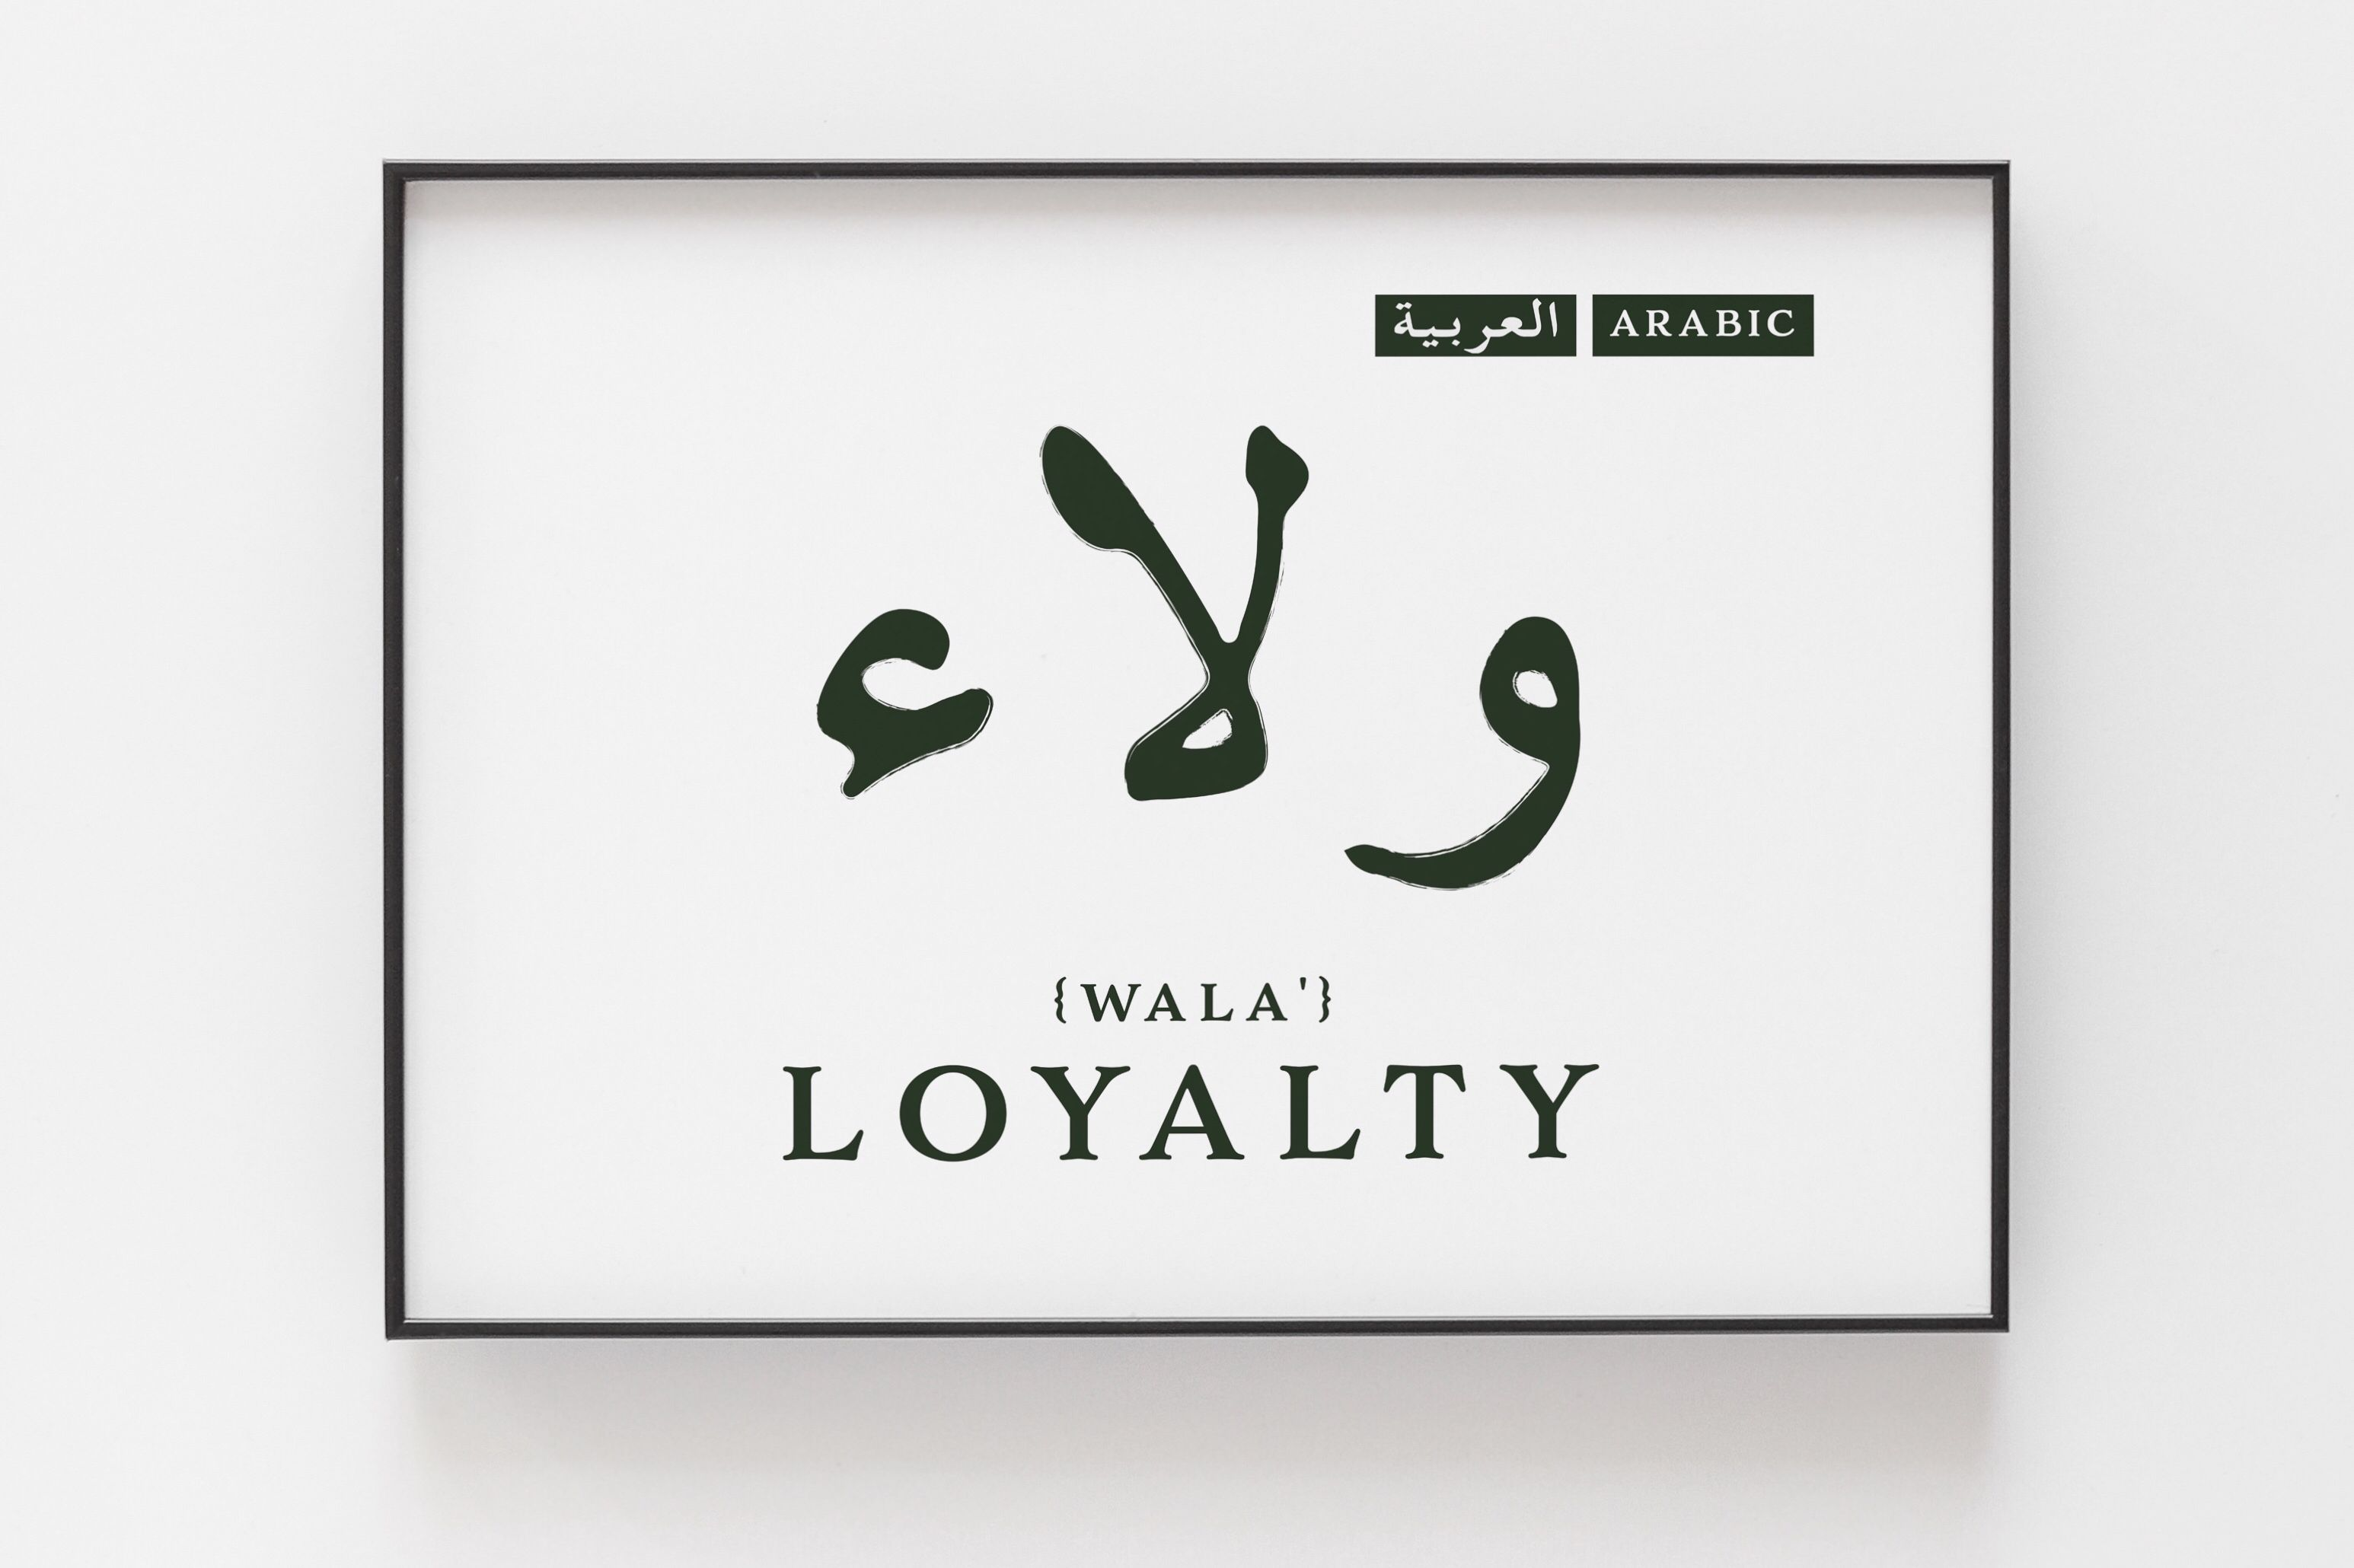 Arabic Islamic Loyalty Art Print Wall Art Hole Decor Calligraphy Etsy Thecivilisationco Wall Art Prints Art Prints Print